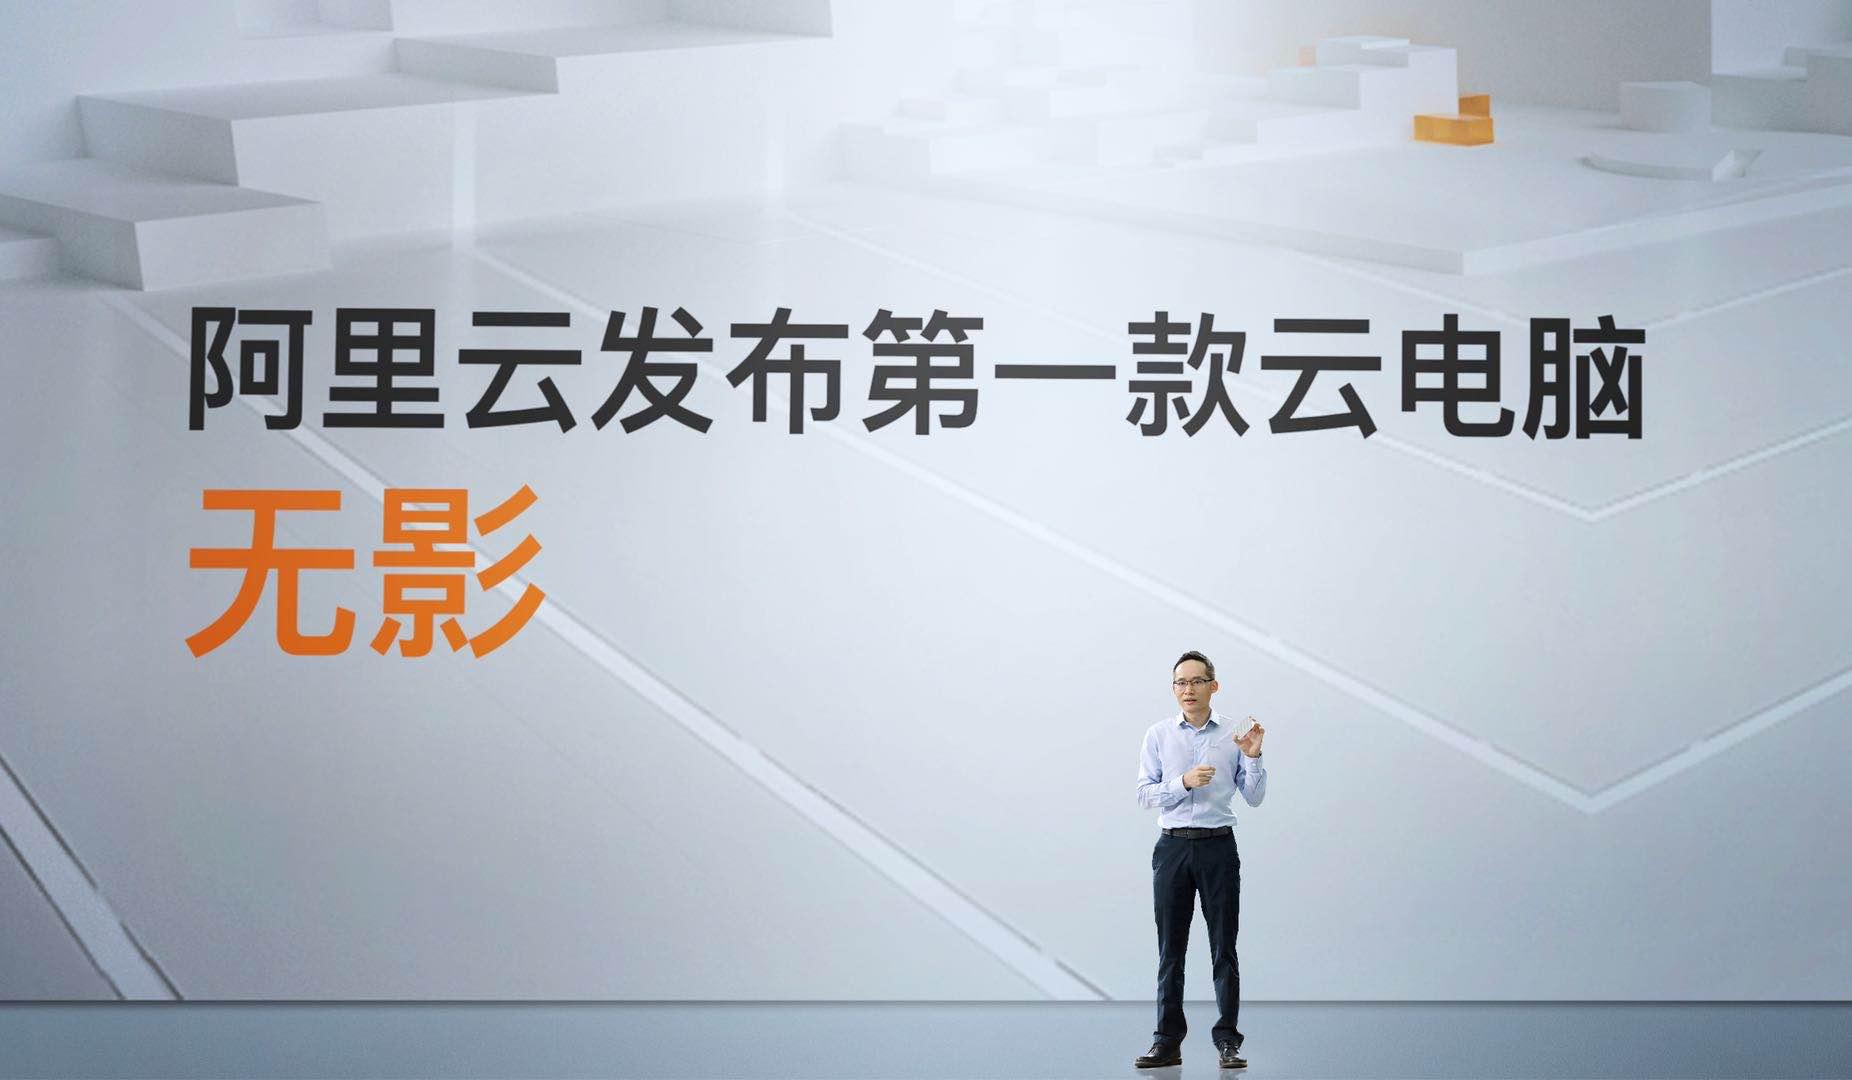 【ToB快讯】阿里云发布第一款云电脑无影,抢占CC (Cloud Computer)赛道